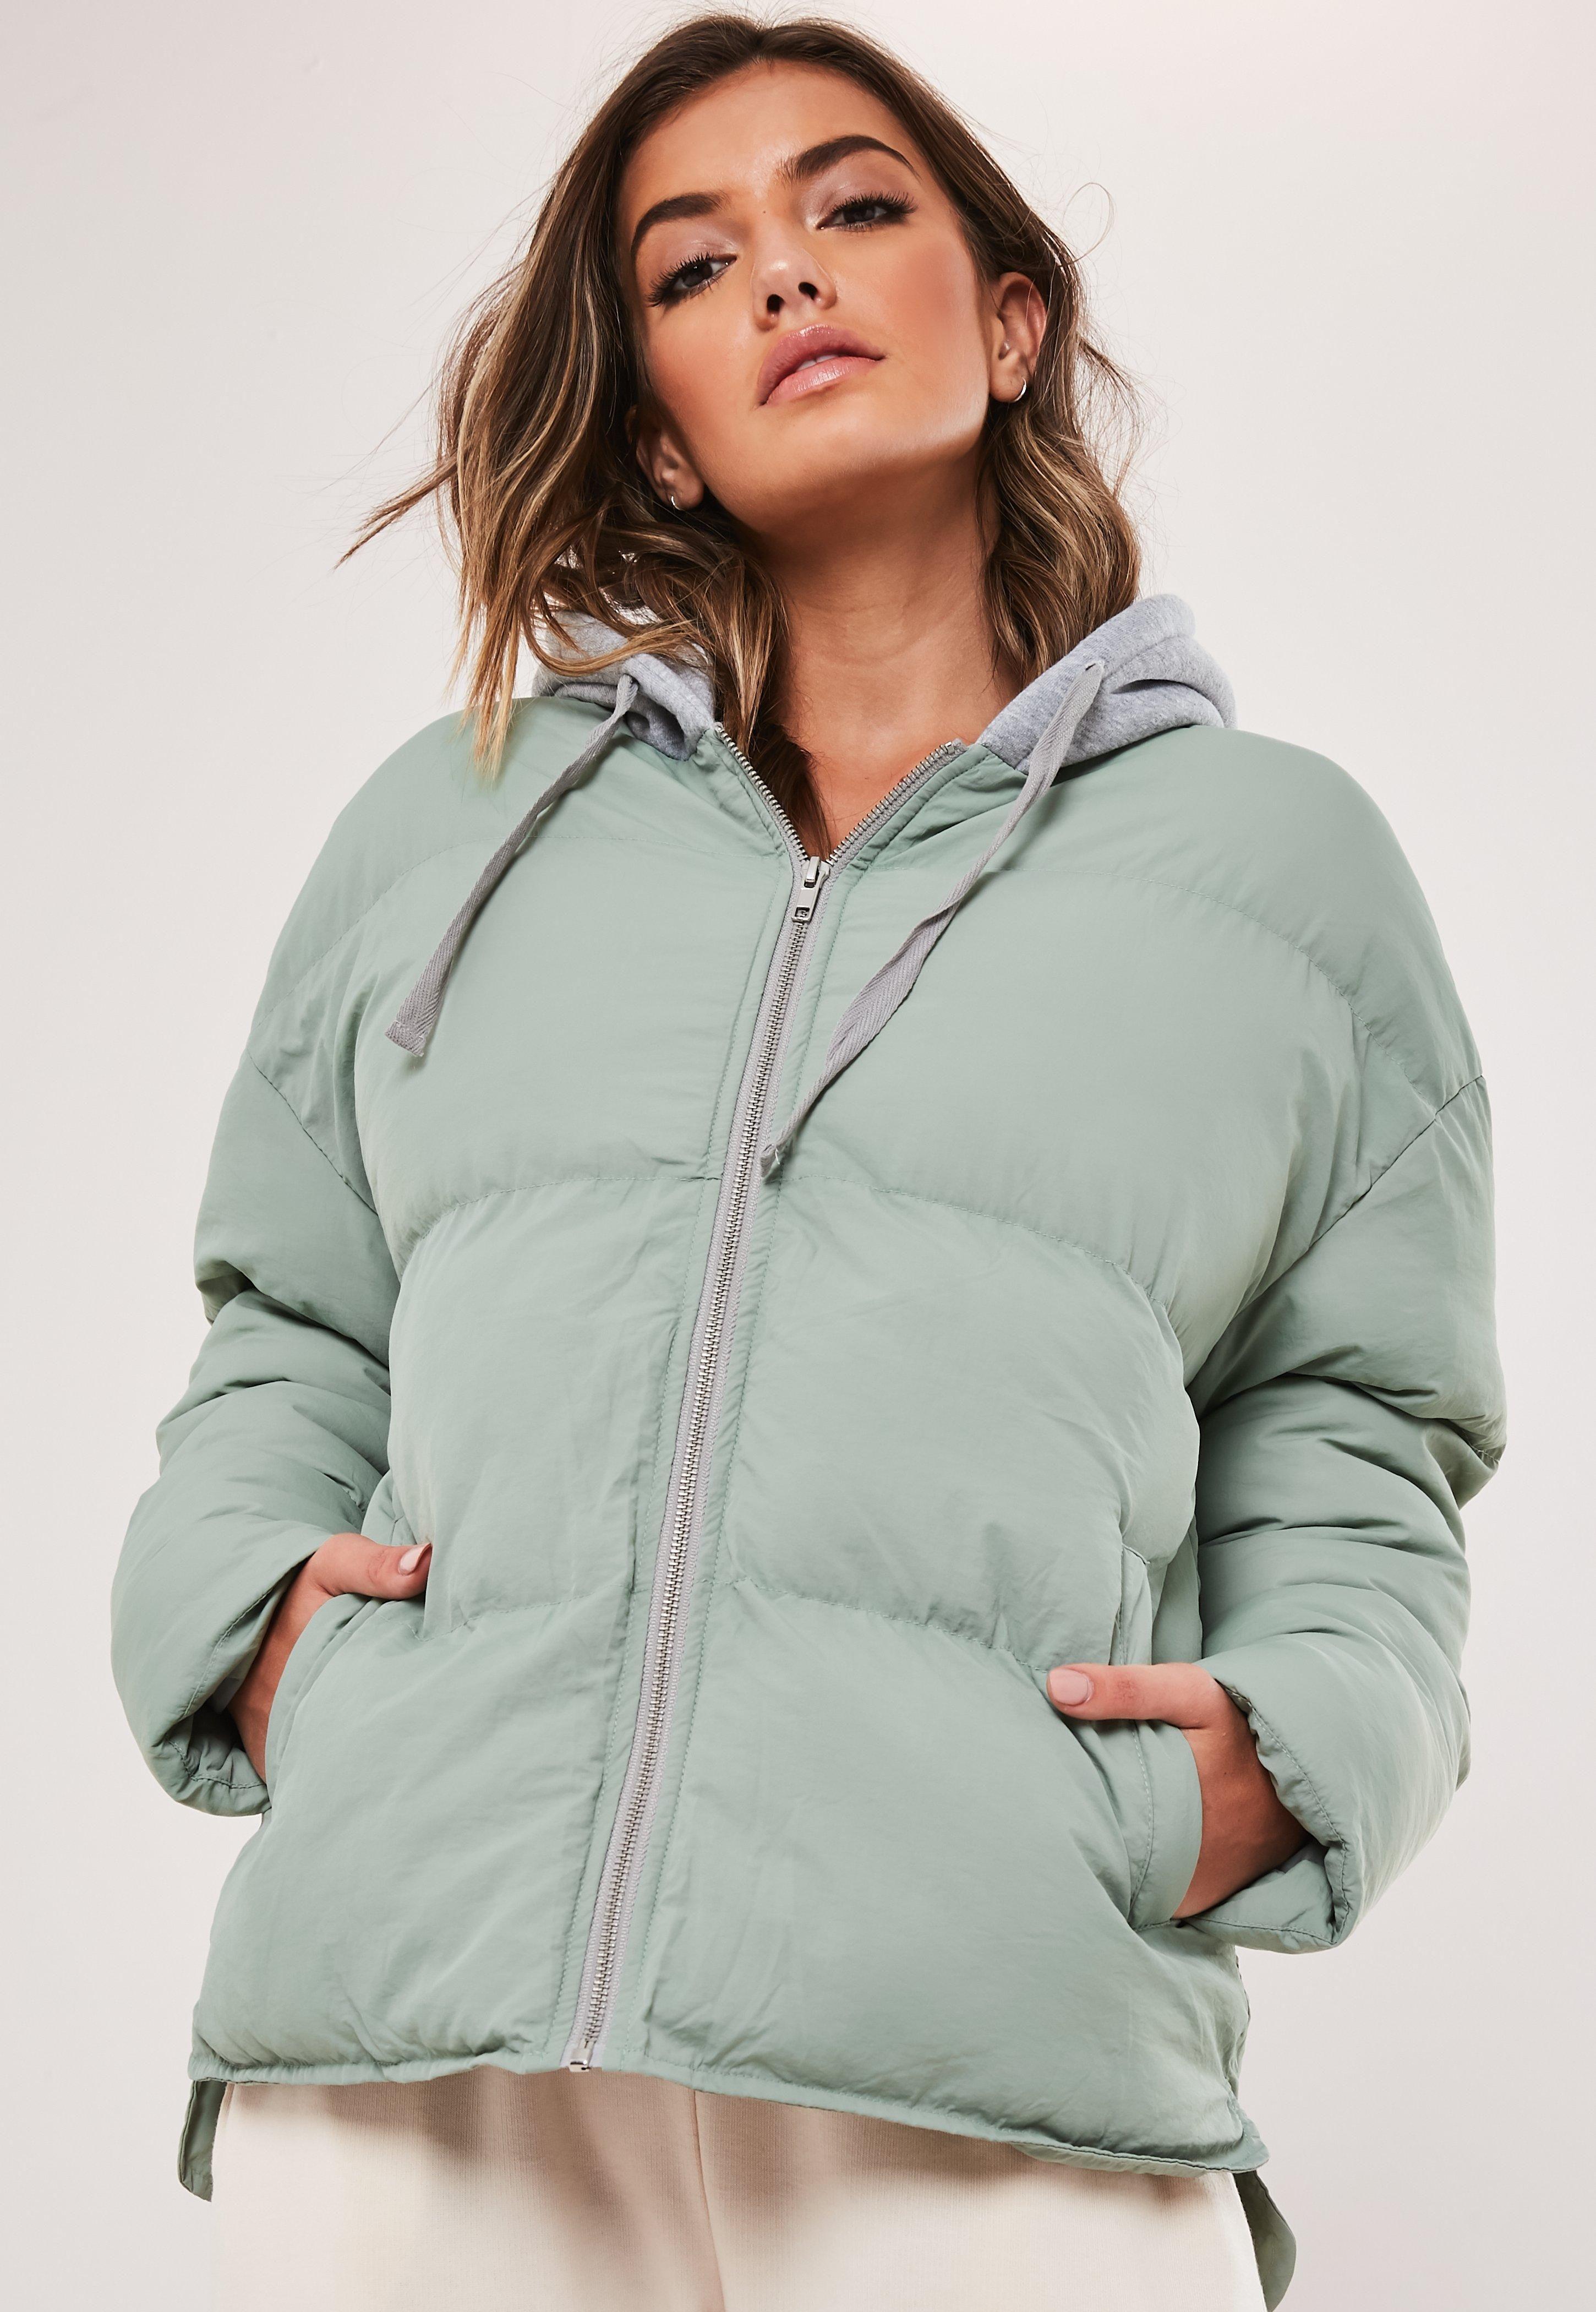 Mint Jersey Oversized Puffer Jacket Sponsored Jersey Ad Mint Oversized Jackets Women S Coats Jackets Coats For Women [ 4200 x 2900 Pixel ]